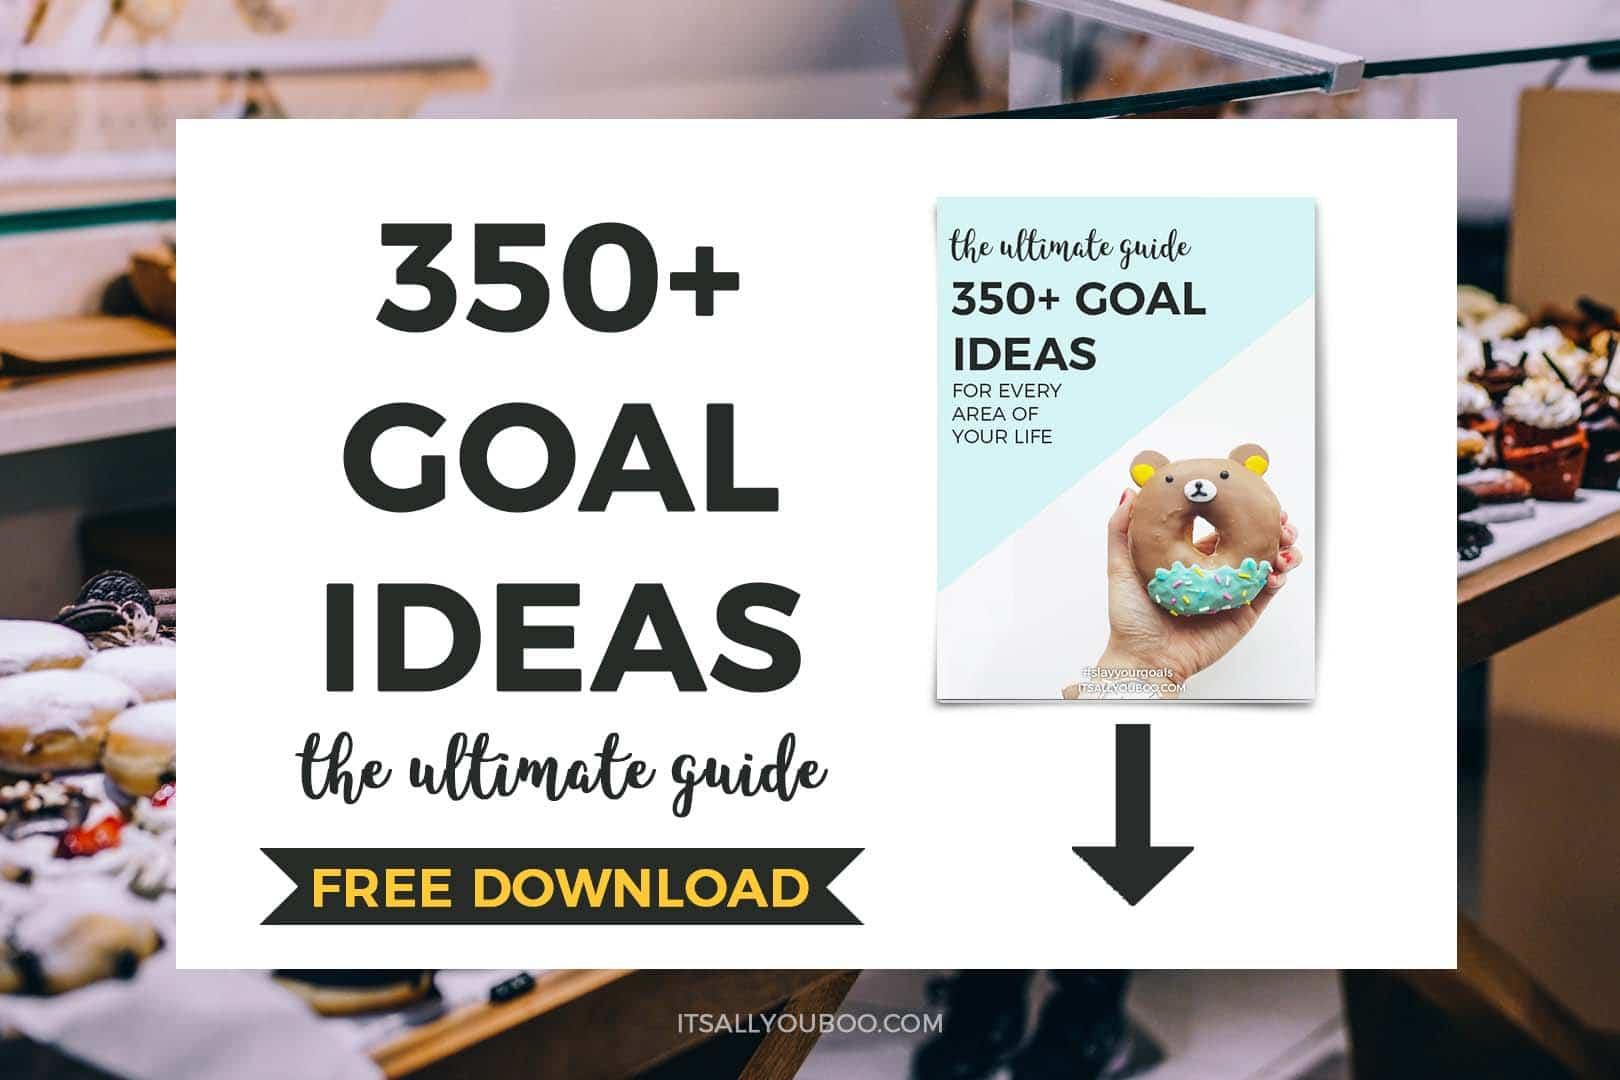 350+ Goal Ideas FREE DOWNLOAD